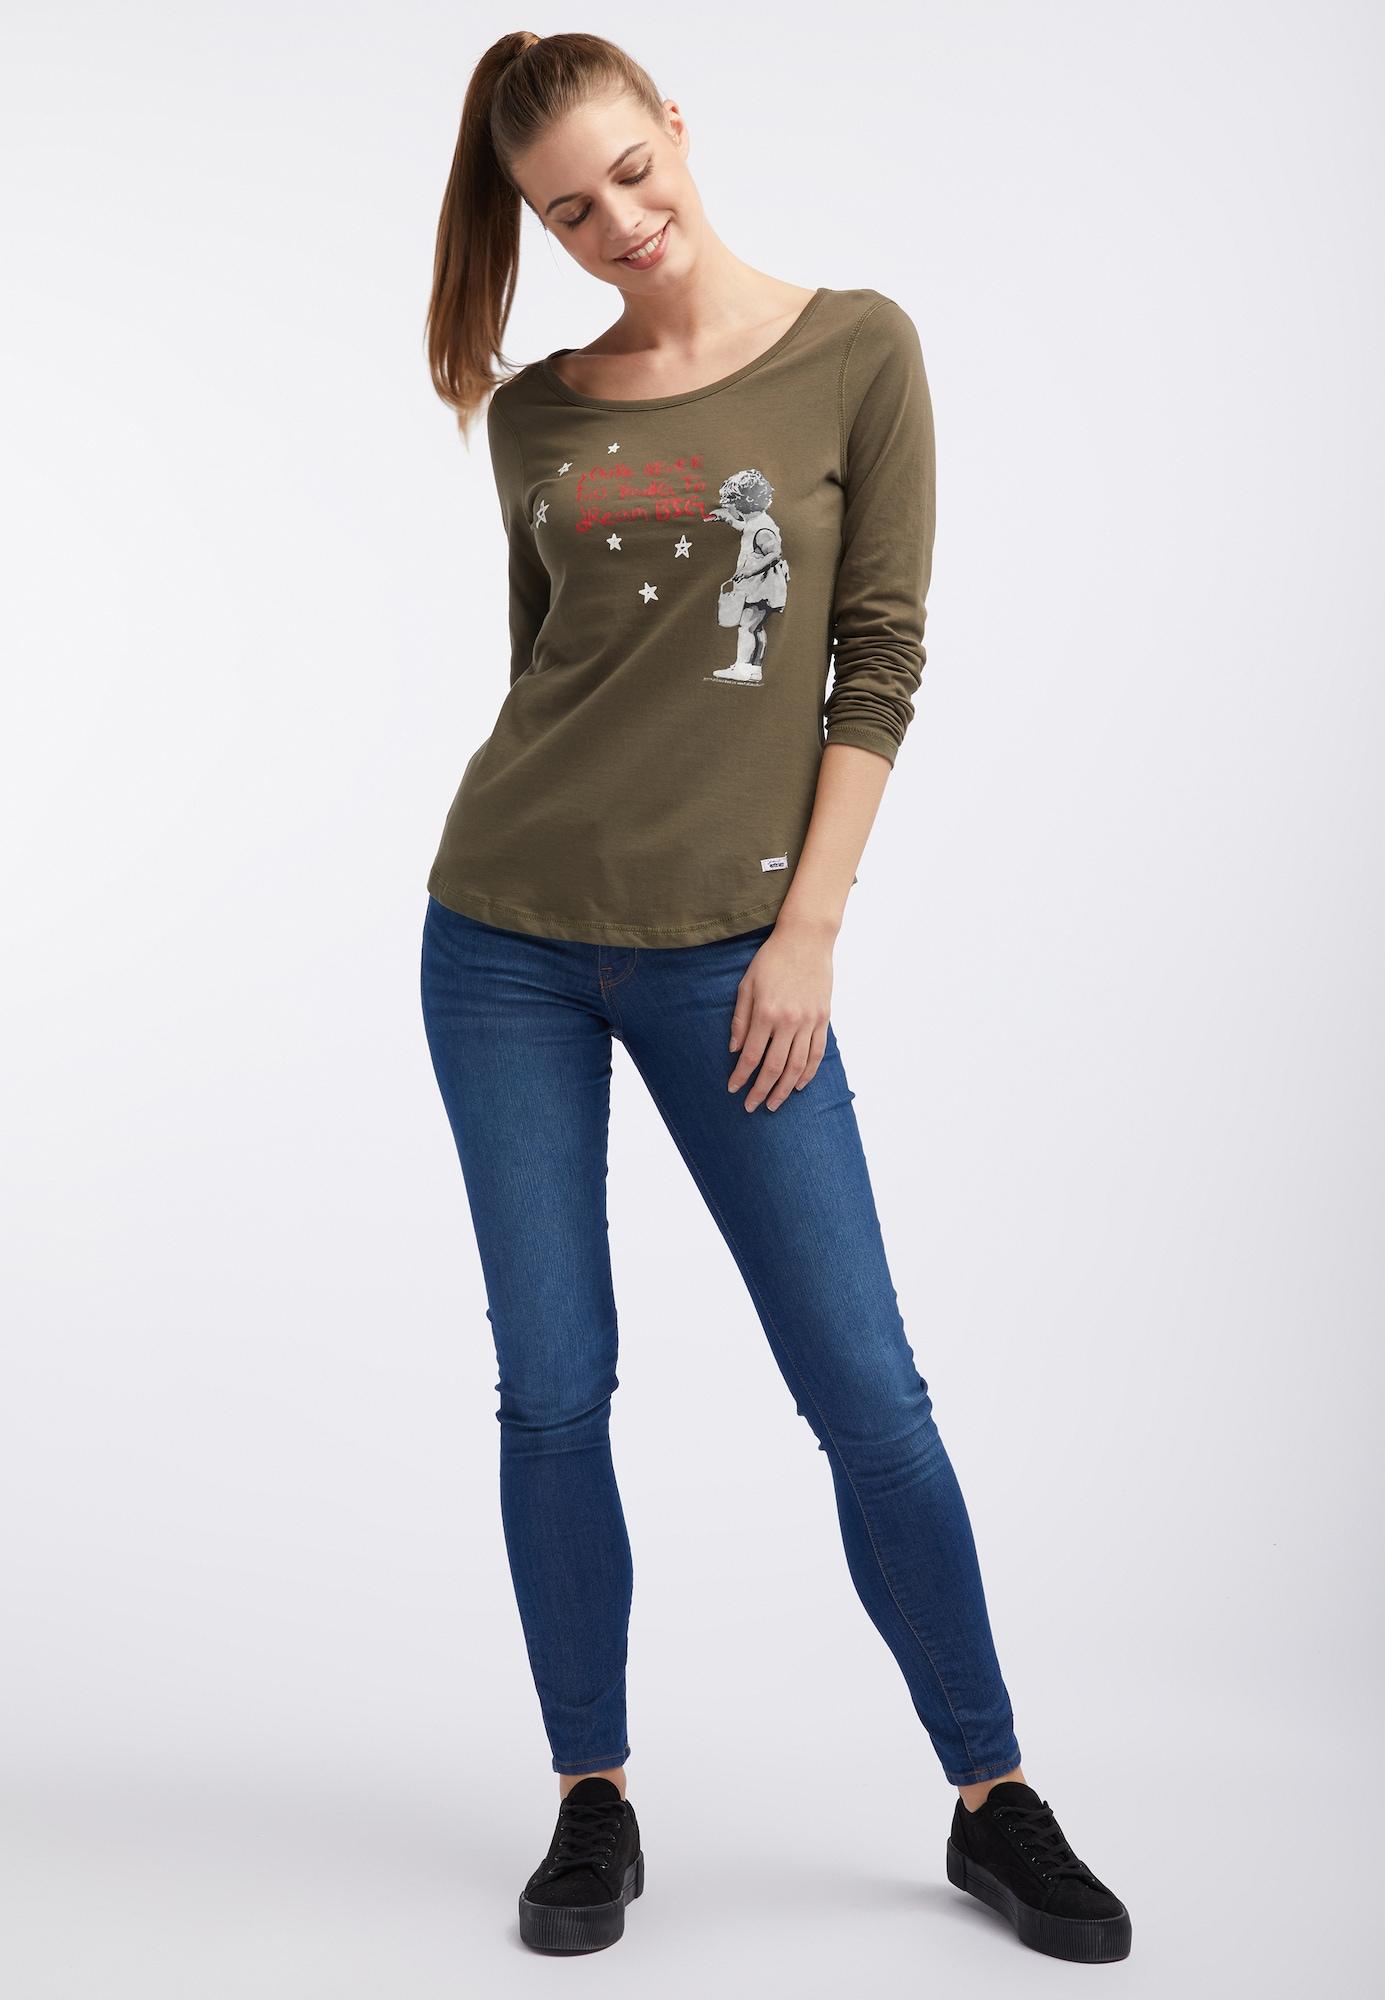 HOMEBASE, Damen Shirt, olijfgroen